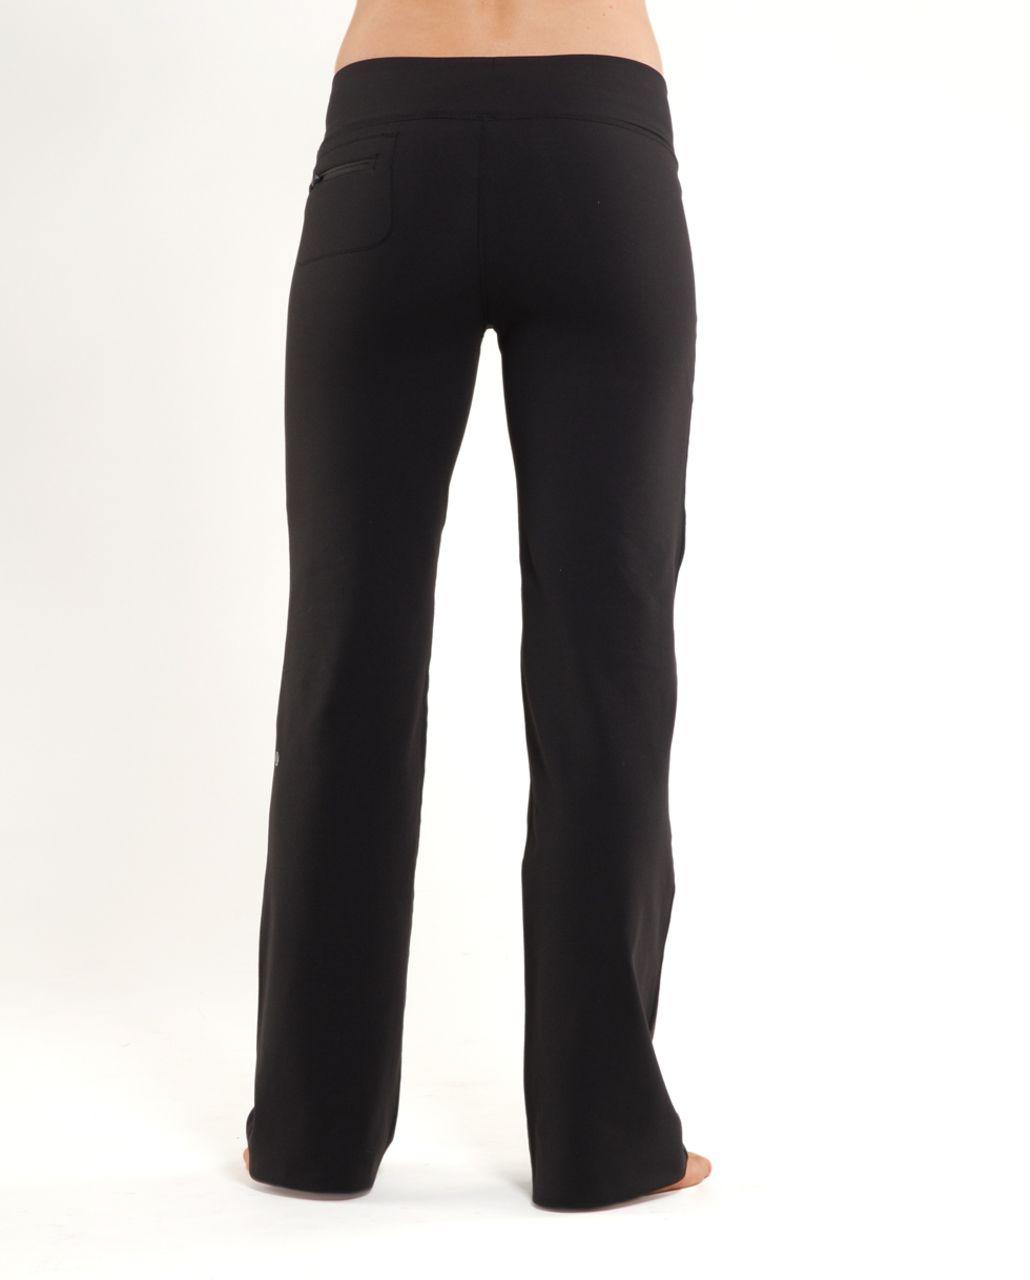 Lululemon Relaxed Fit Pant *Brushed - Black